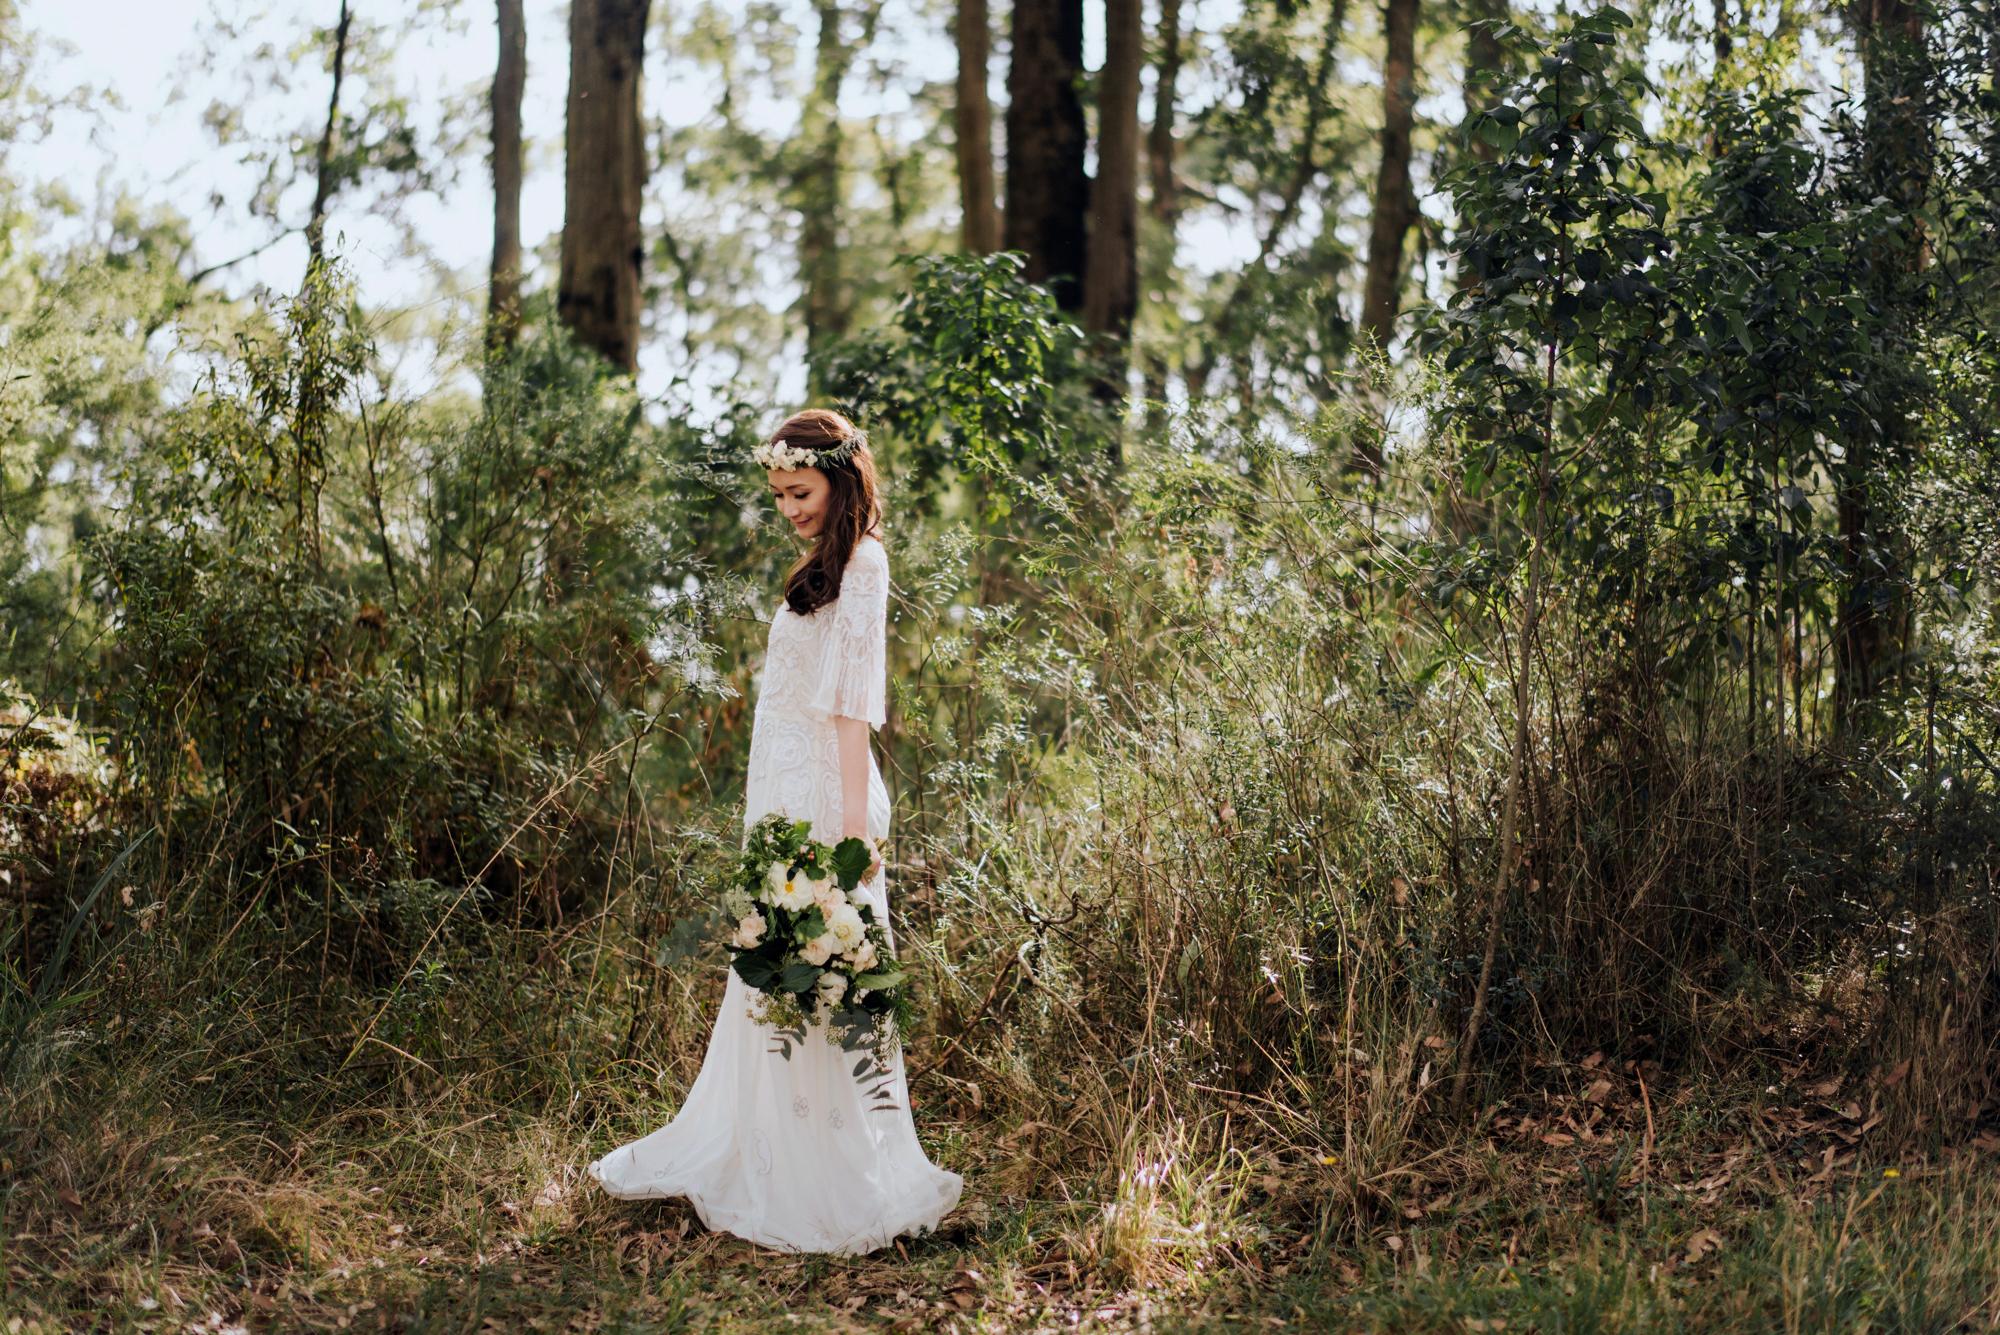 052-melbourne-prewedding-engagement-photography